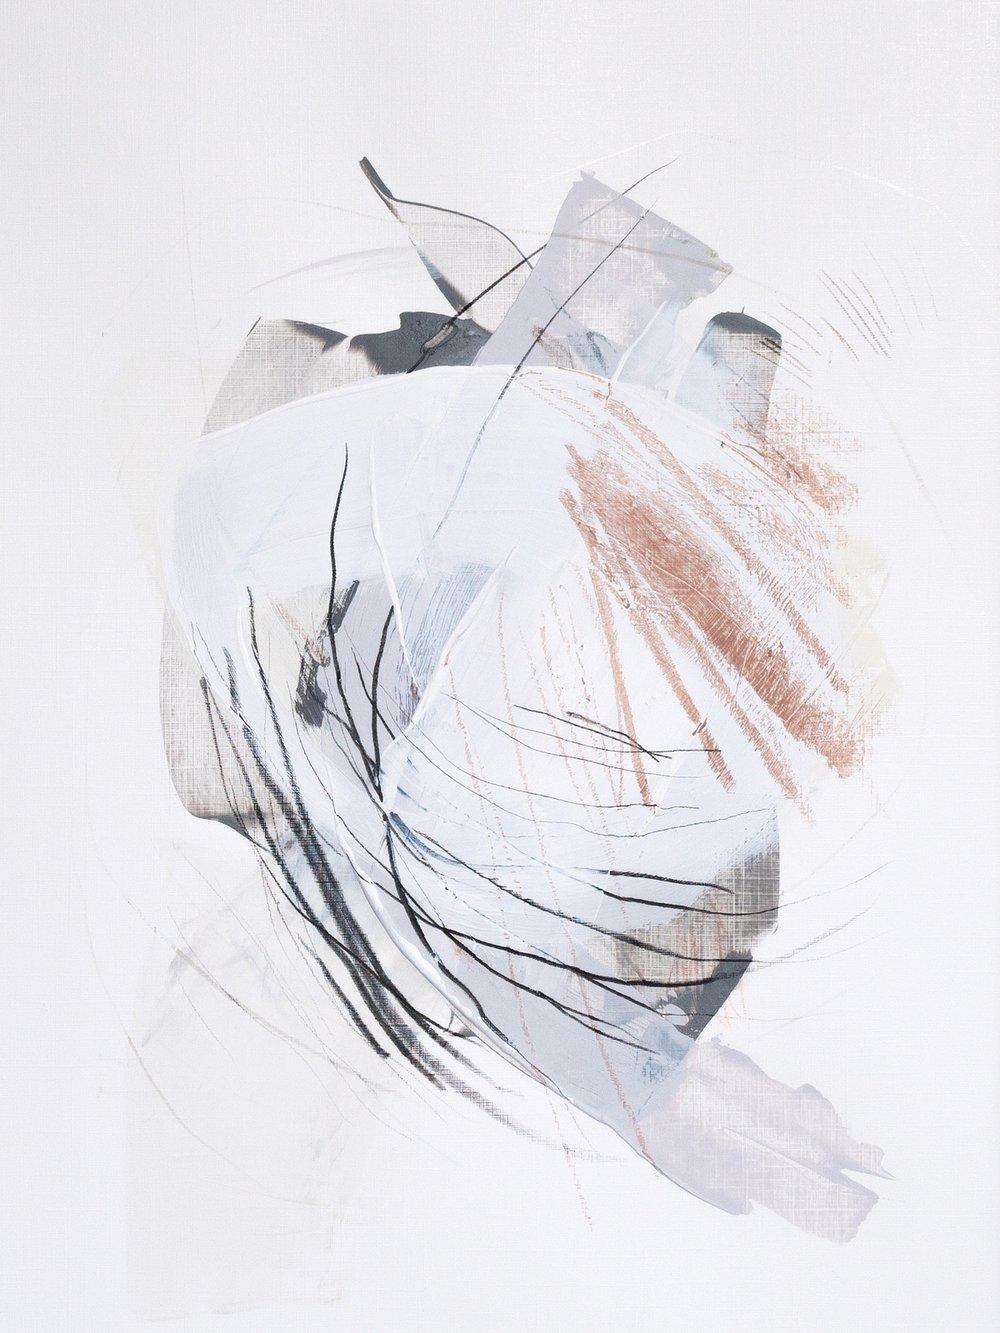 2018_Paintings_RebeccaRuetten_Rehe_2_1-6.jpg